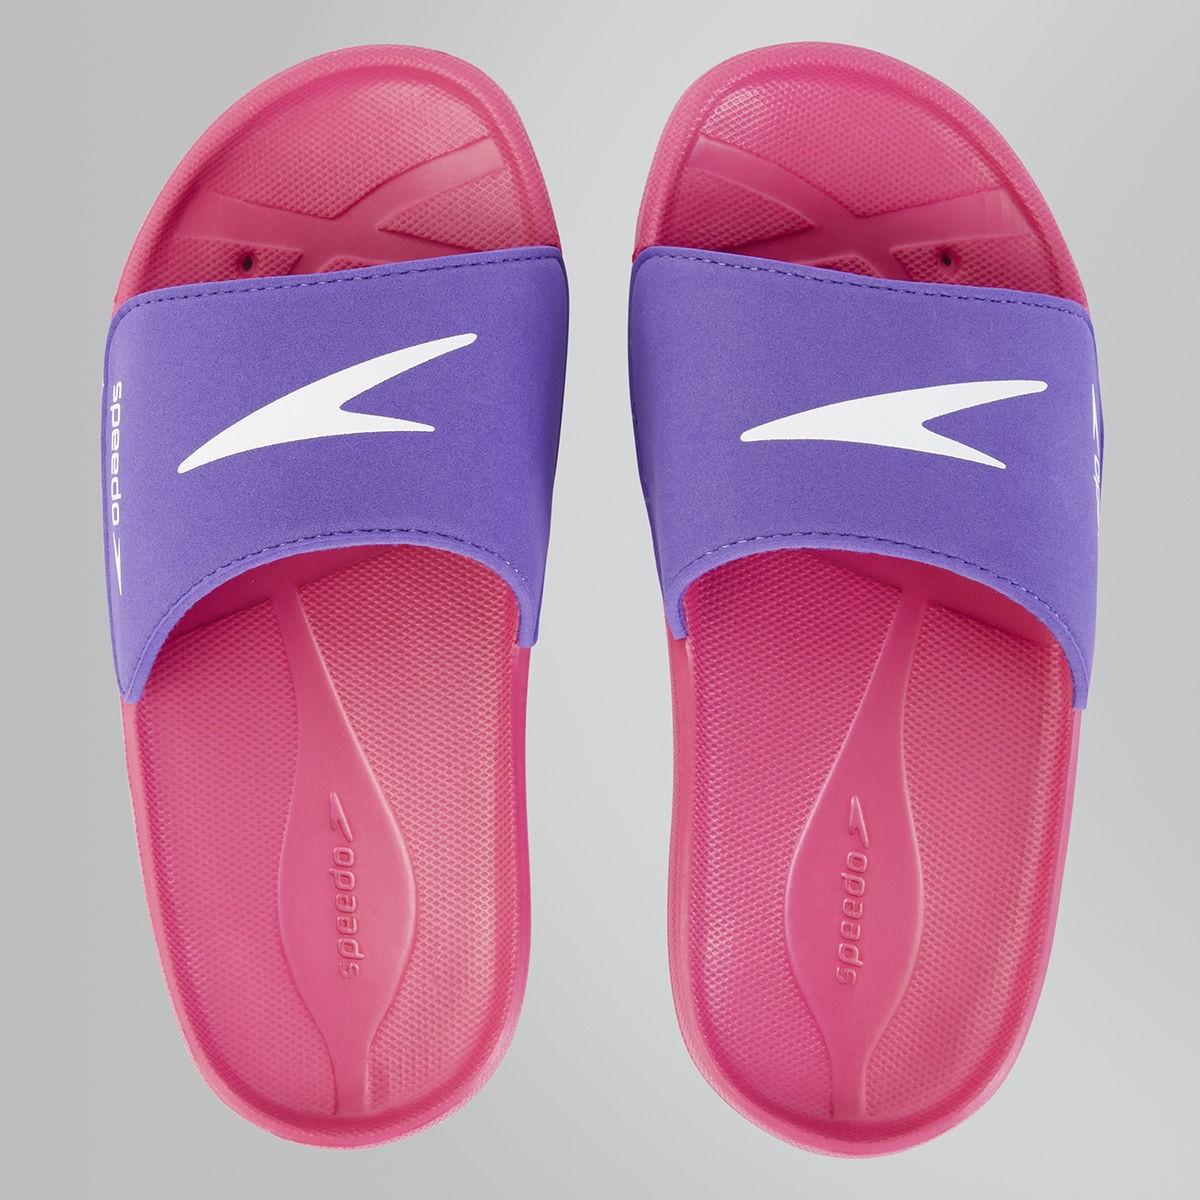 Speedo Atami Core jr pink-purple